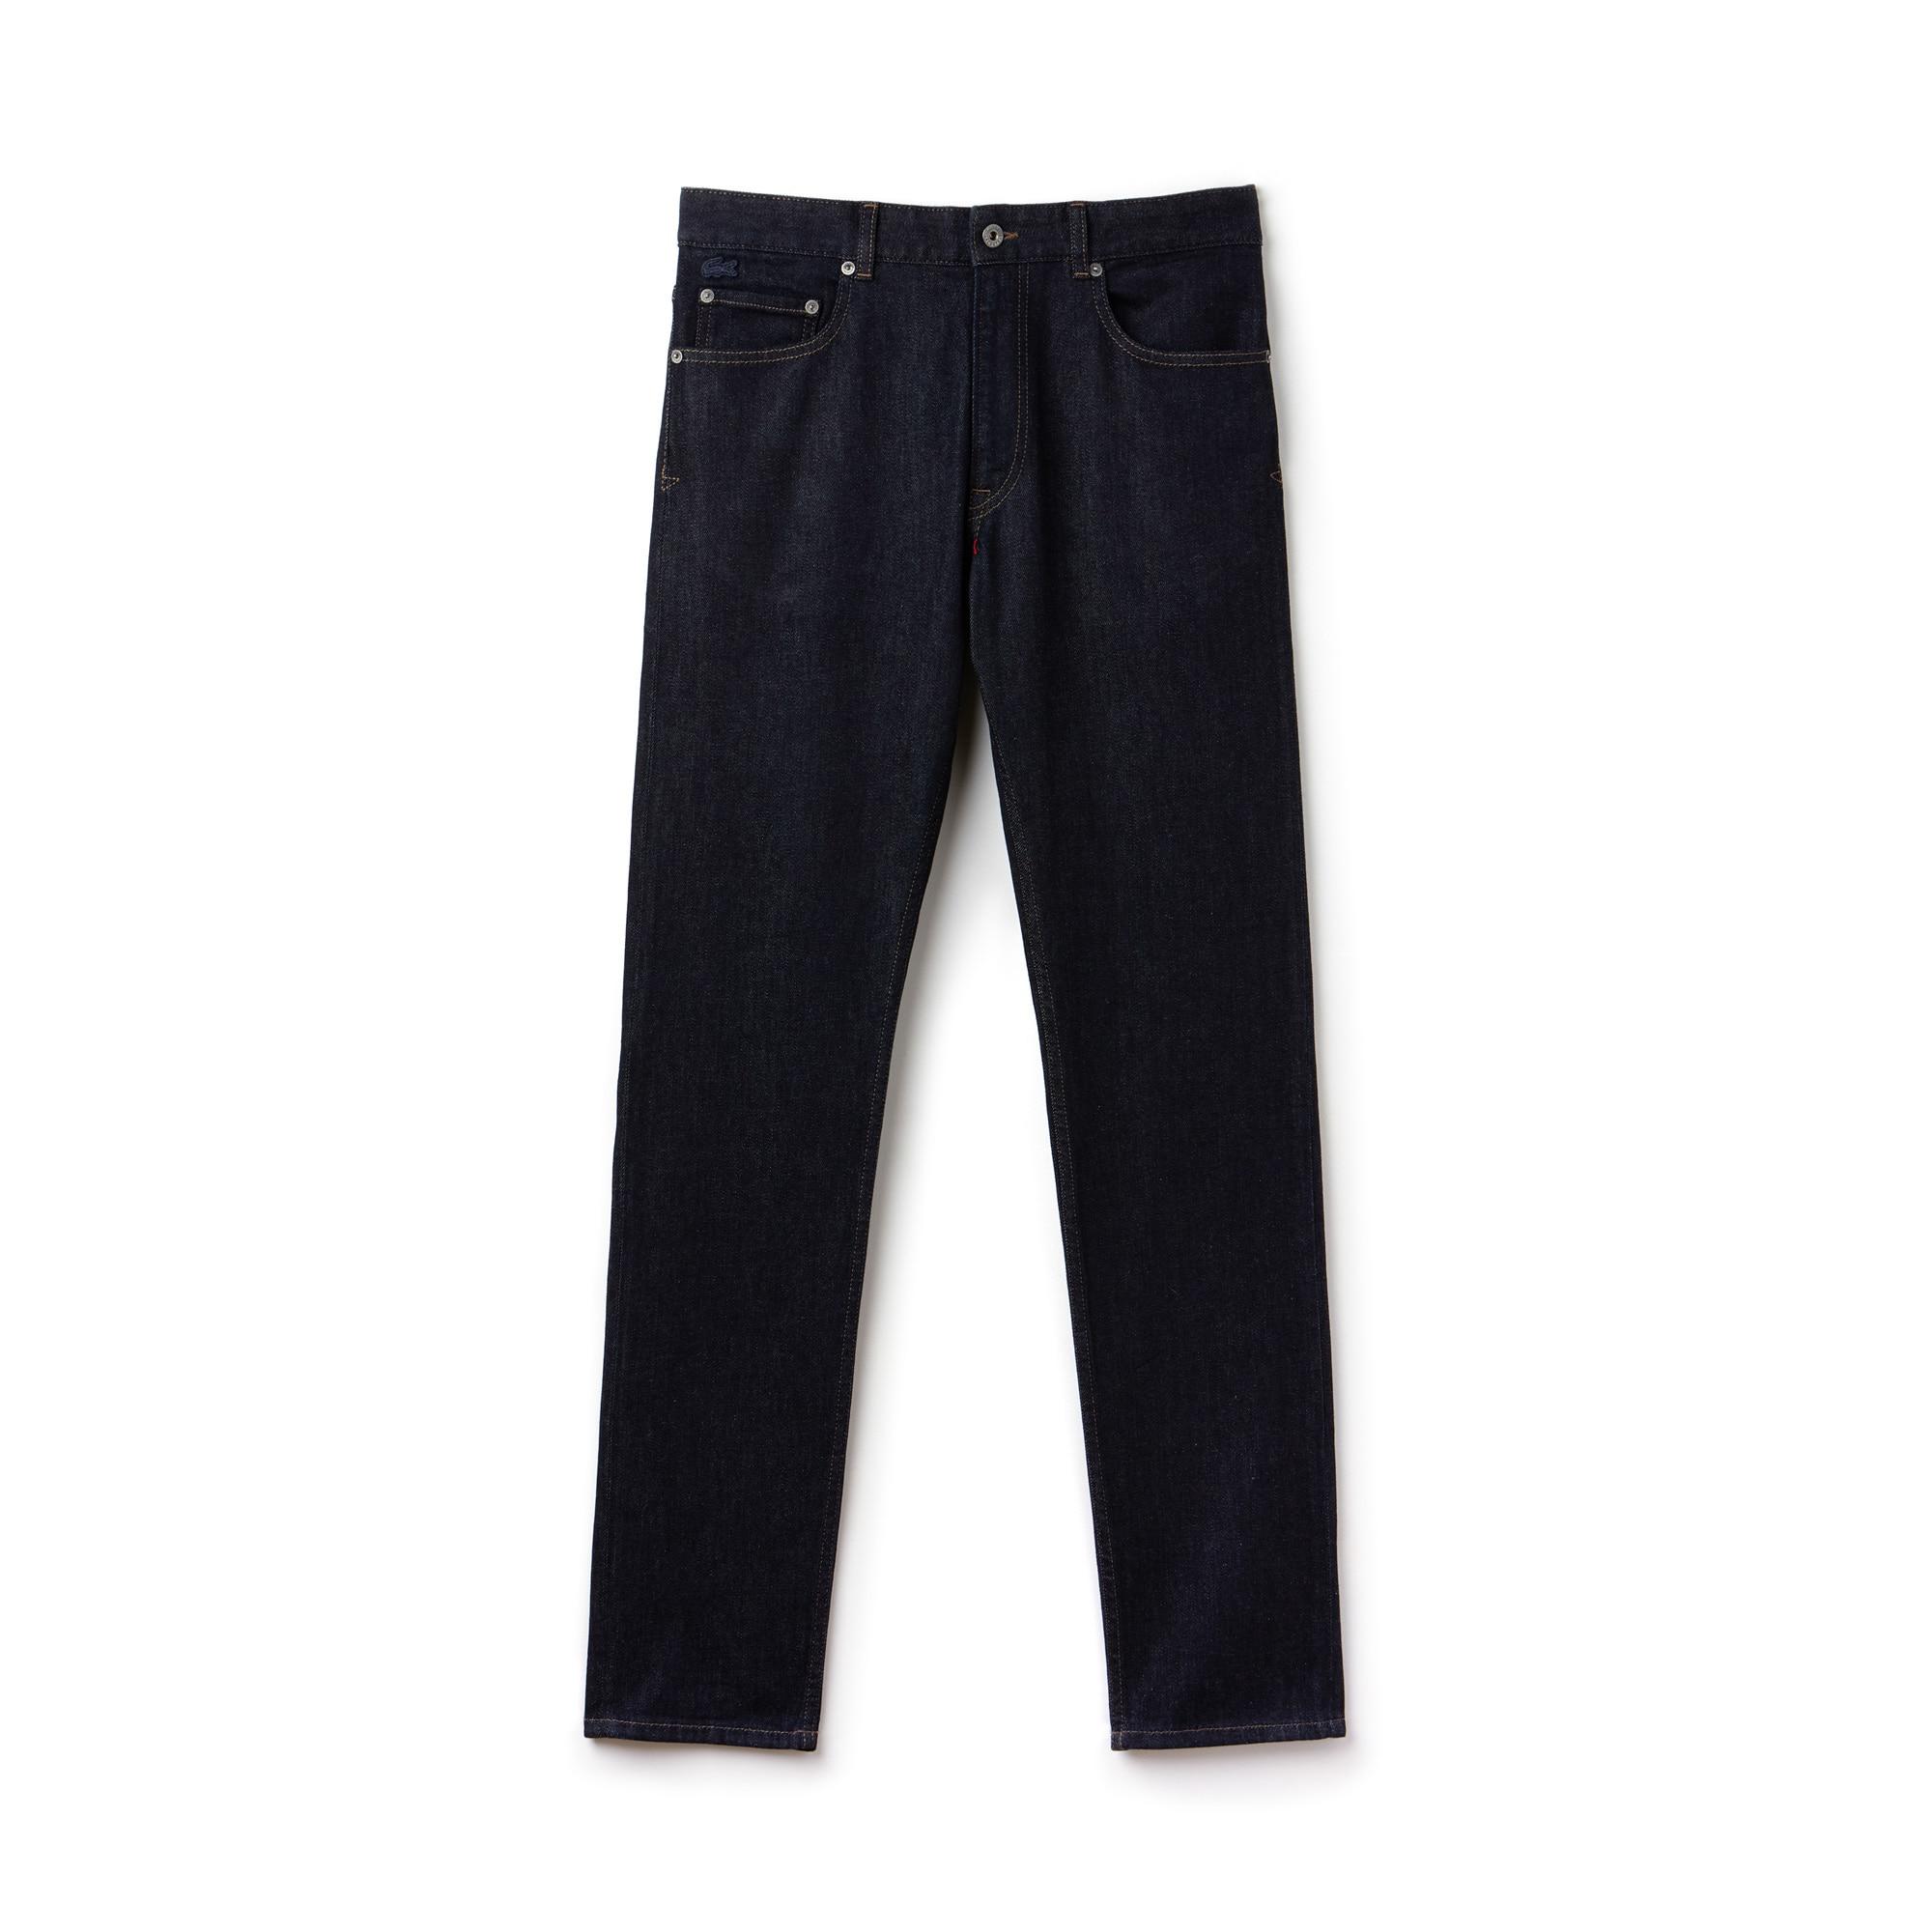 Men's Slim Fit 5 Pocket Stretch Cotton Denim Jeans